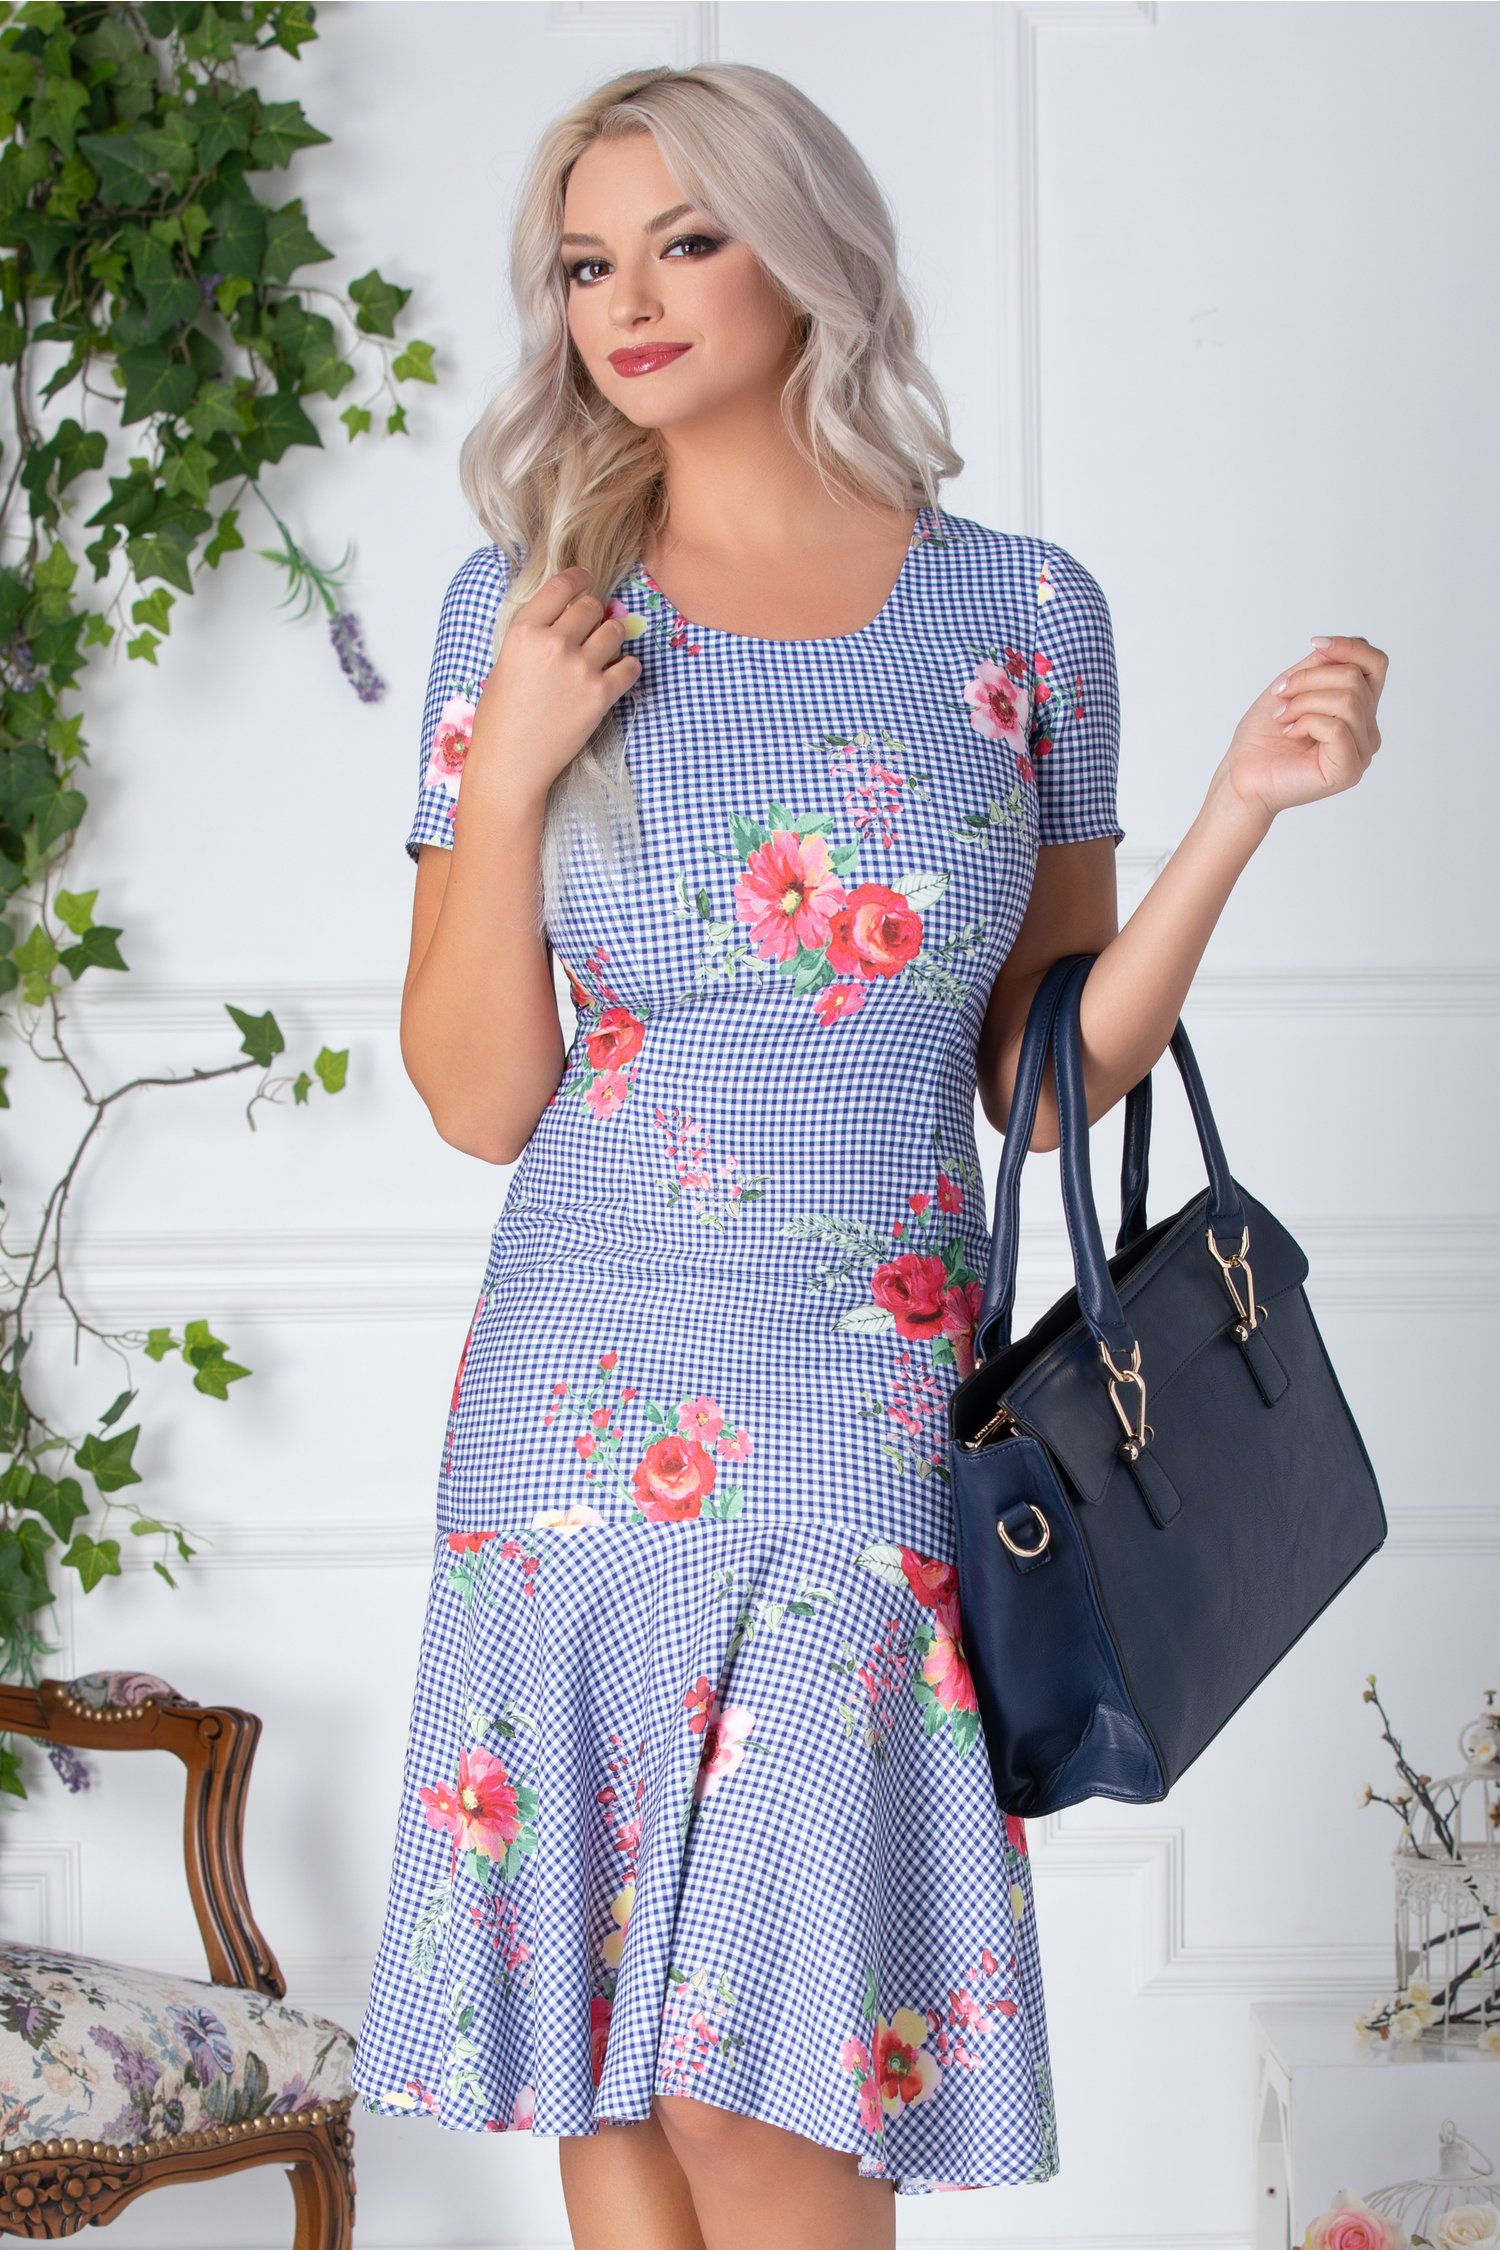 Rochie Mia alba cu patratele albastre si flori roz